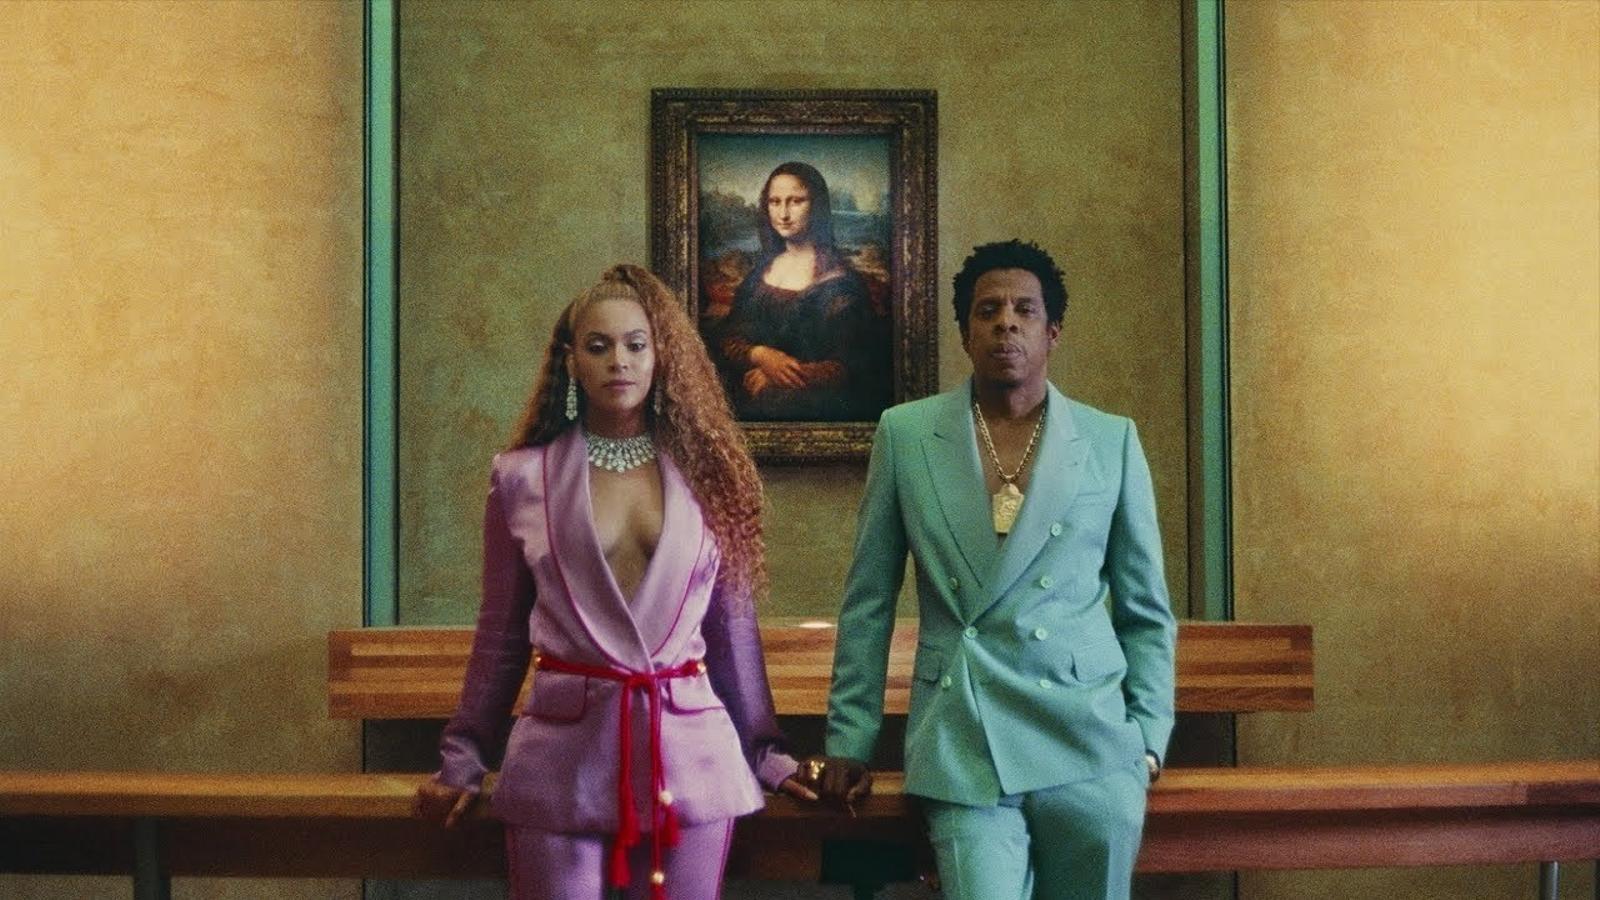 El videoclip de Beyoncé i Jay Z 'Apeshit'